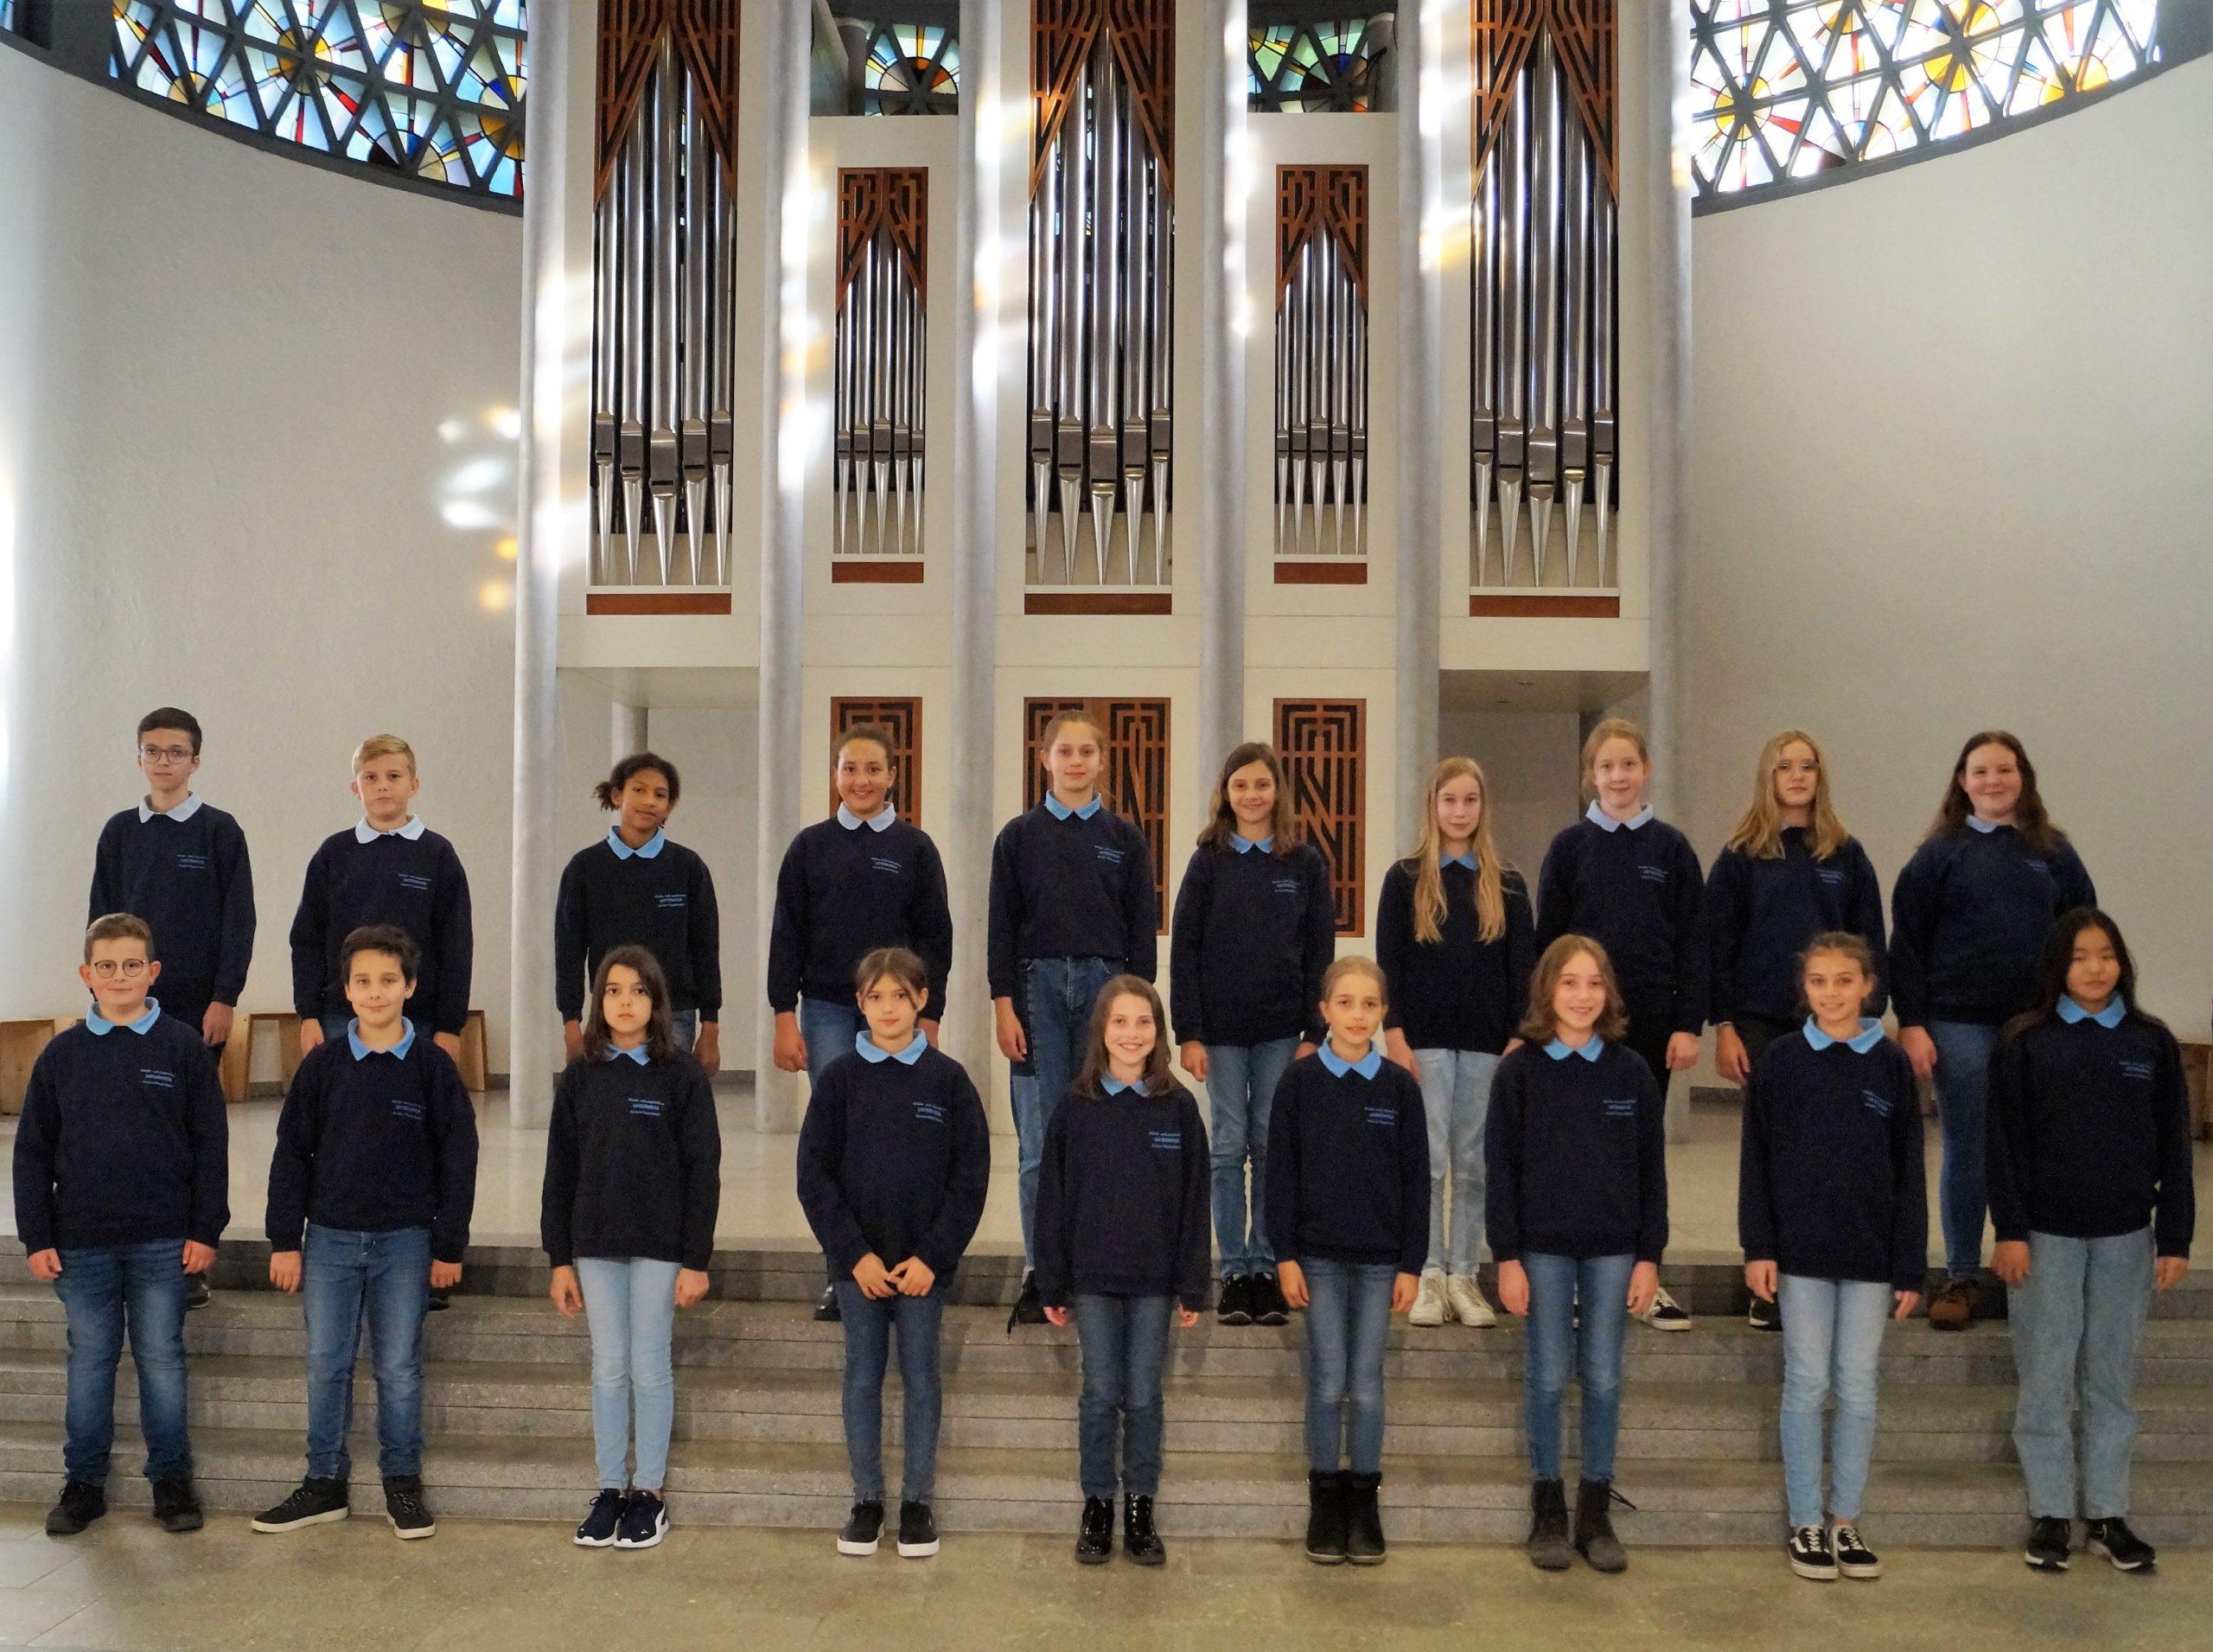 Es singt: der Jugendchor Unterwegs Achern-Fautenbach